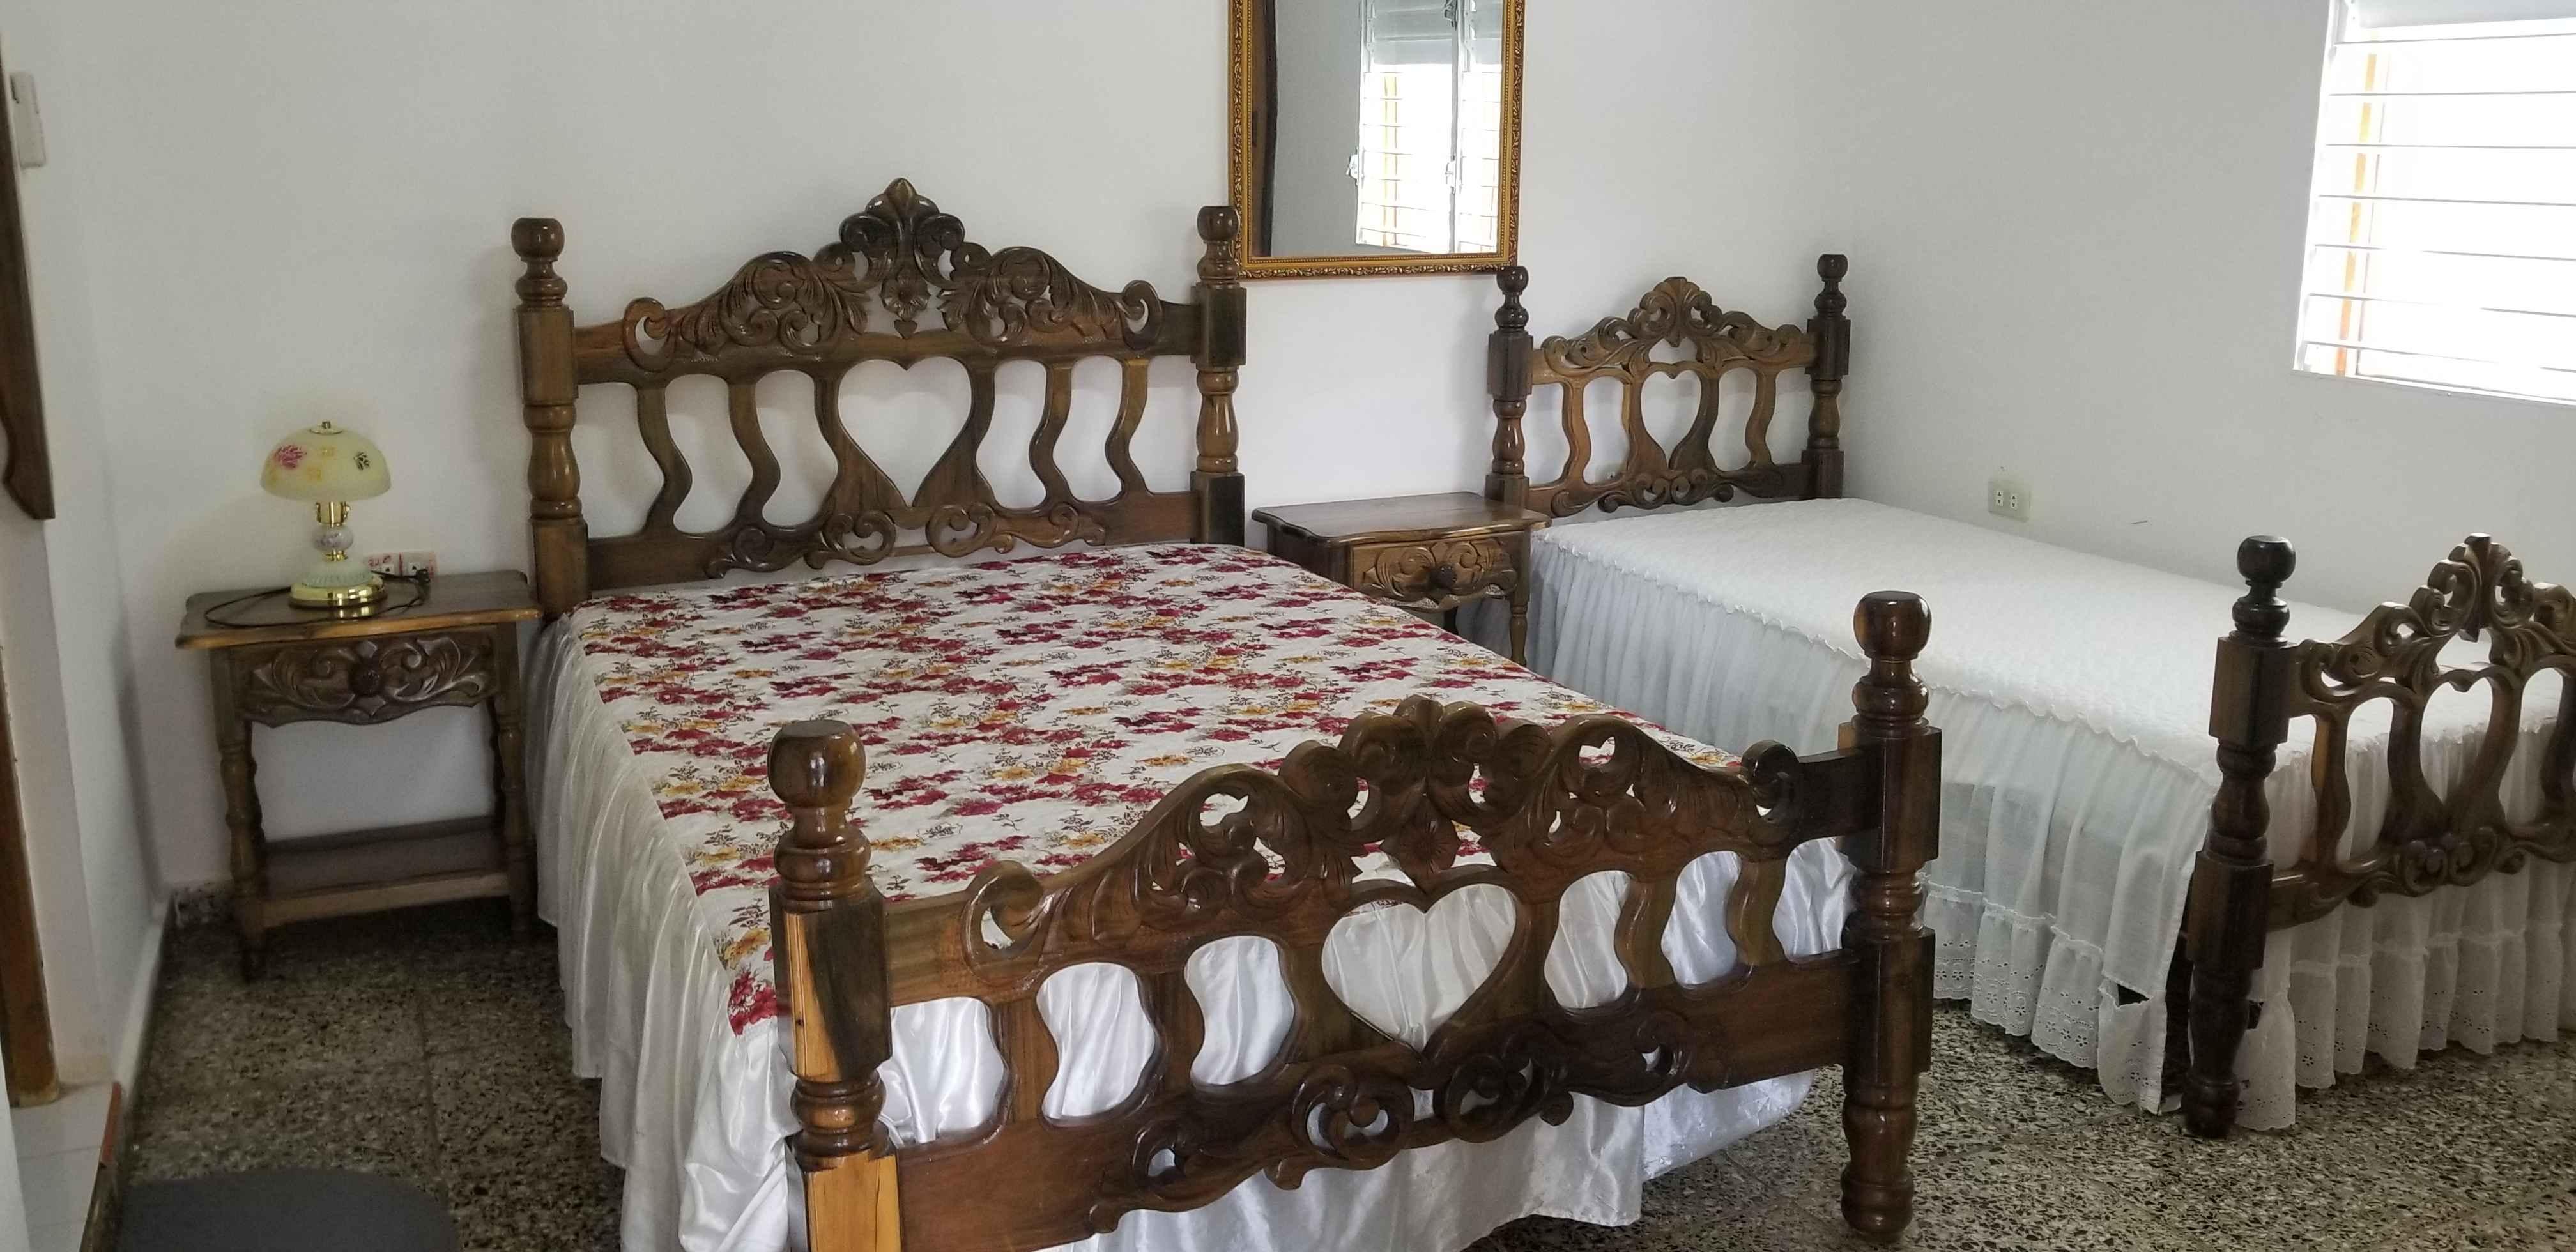 SOR004 – Room 3 Triple bedroom with private bathroom